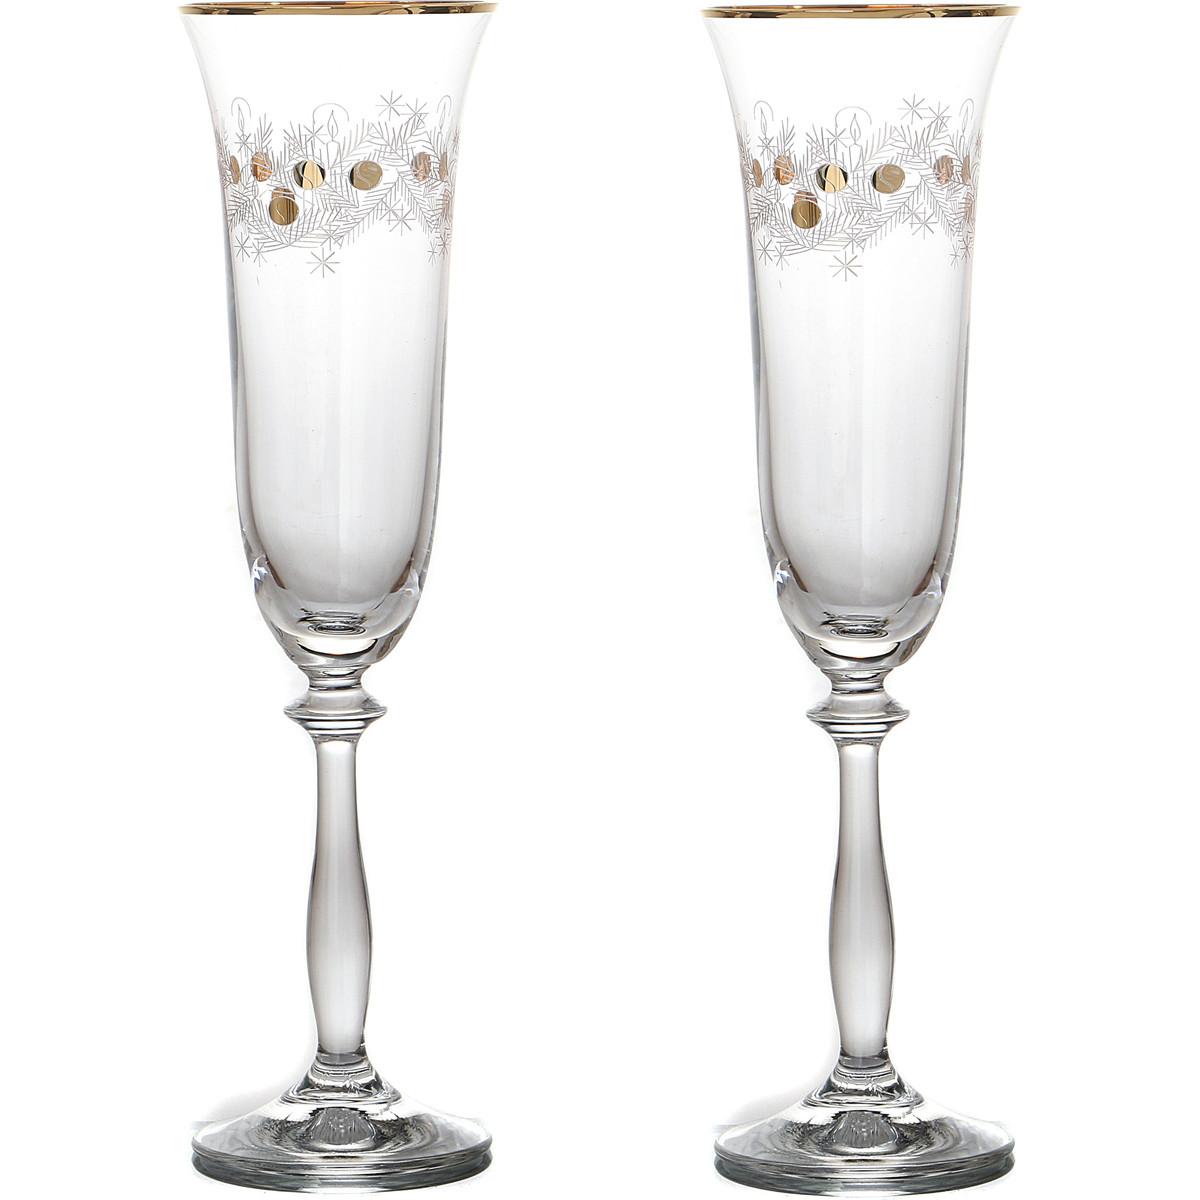 {} Bohemia Crystal Набор бокалов для шампанского Alivia (25 см - 2 шт) bohemia crystal набор бокалов для шампанского felina 25 см 2 шт